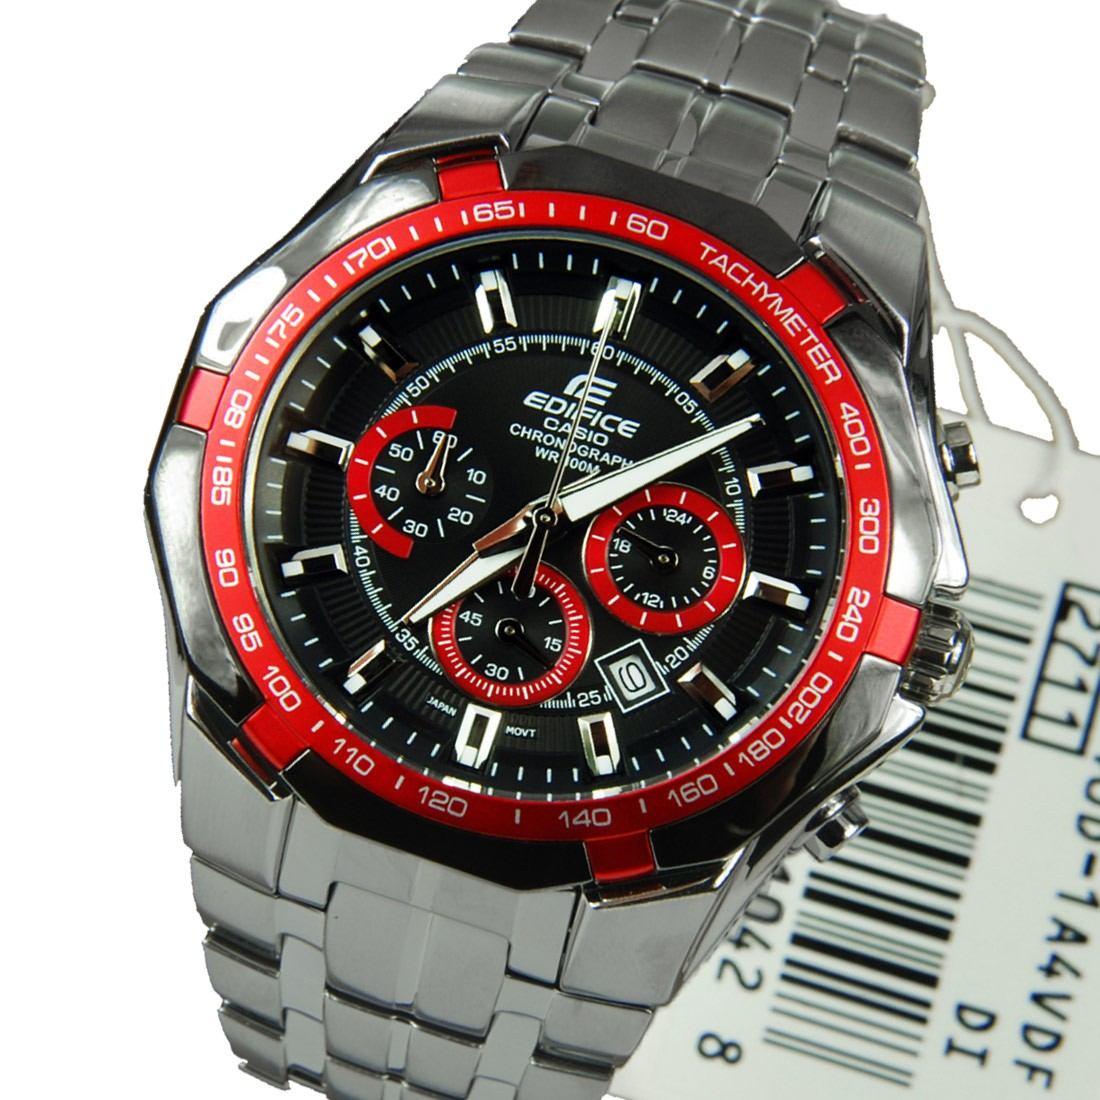 4b1849abe4dd Reloj Casio Edifice Ef-540d-1a4-plateado Con Rojo -   775.900 en ...